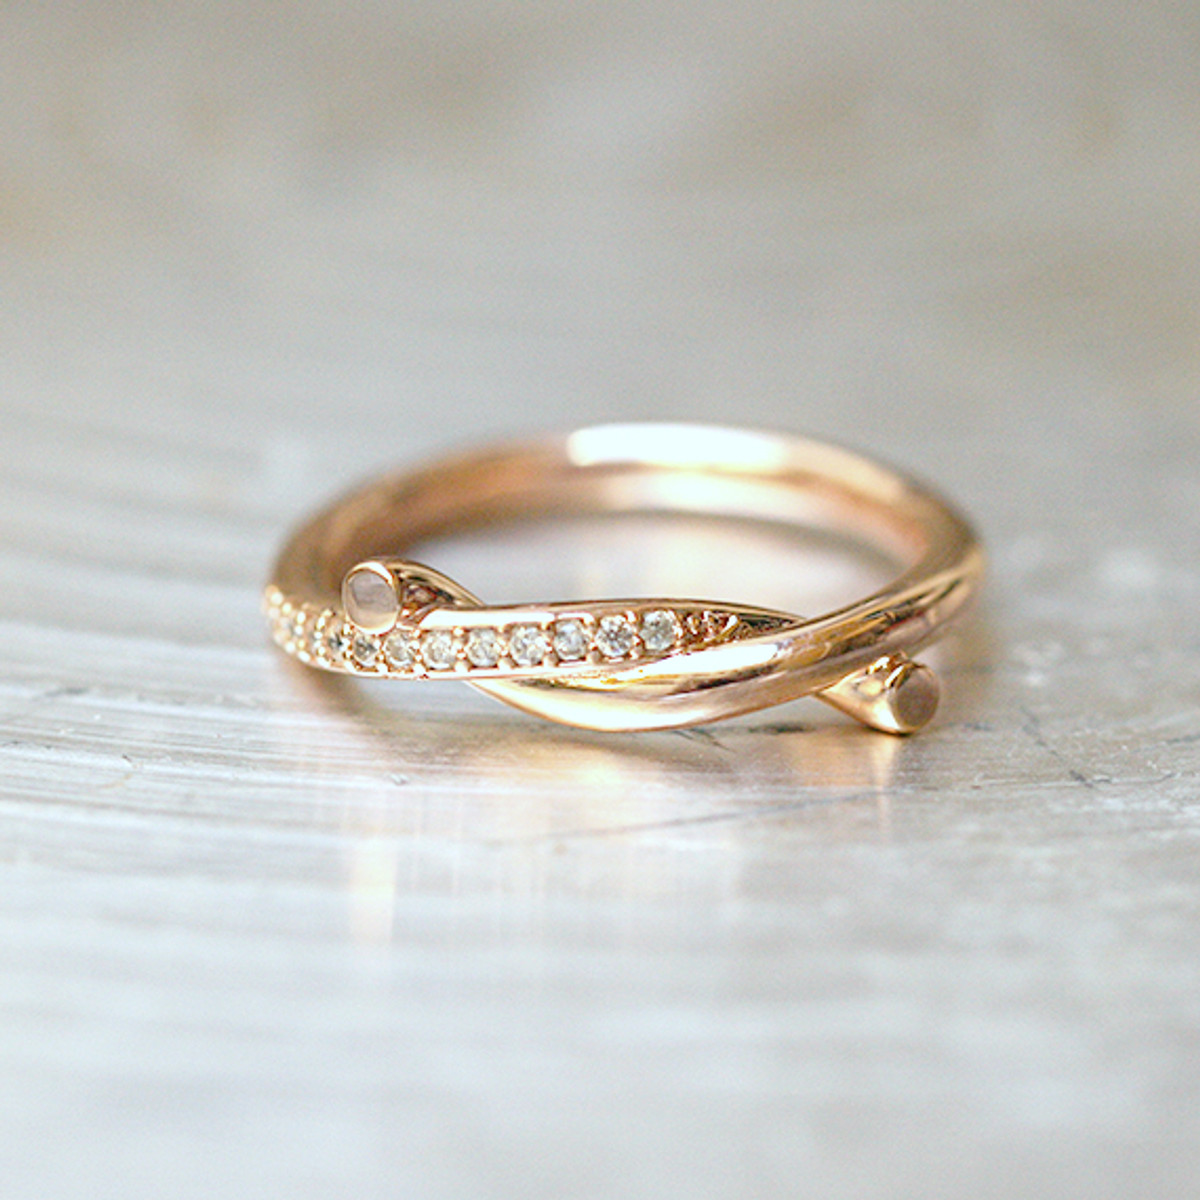 Cz Rose Gold Knot Ring Sterling Silver Kellinsilver Com